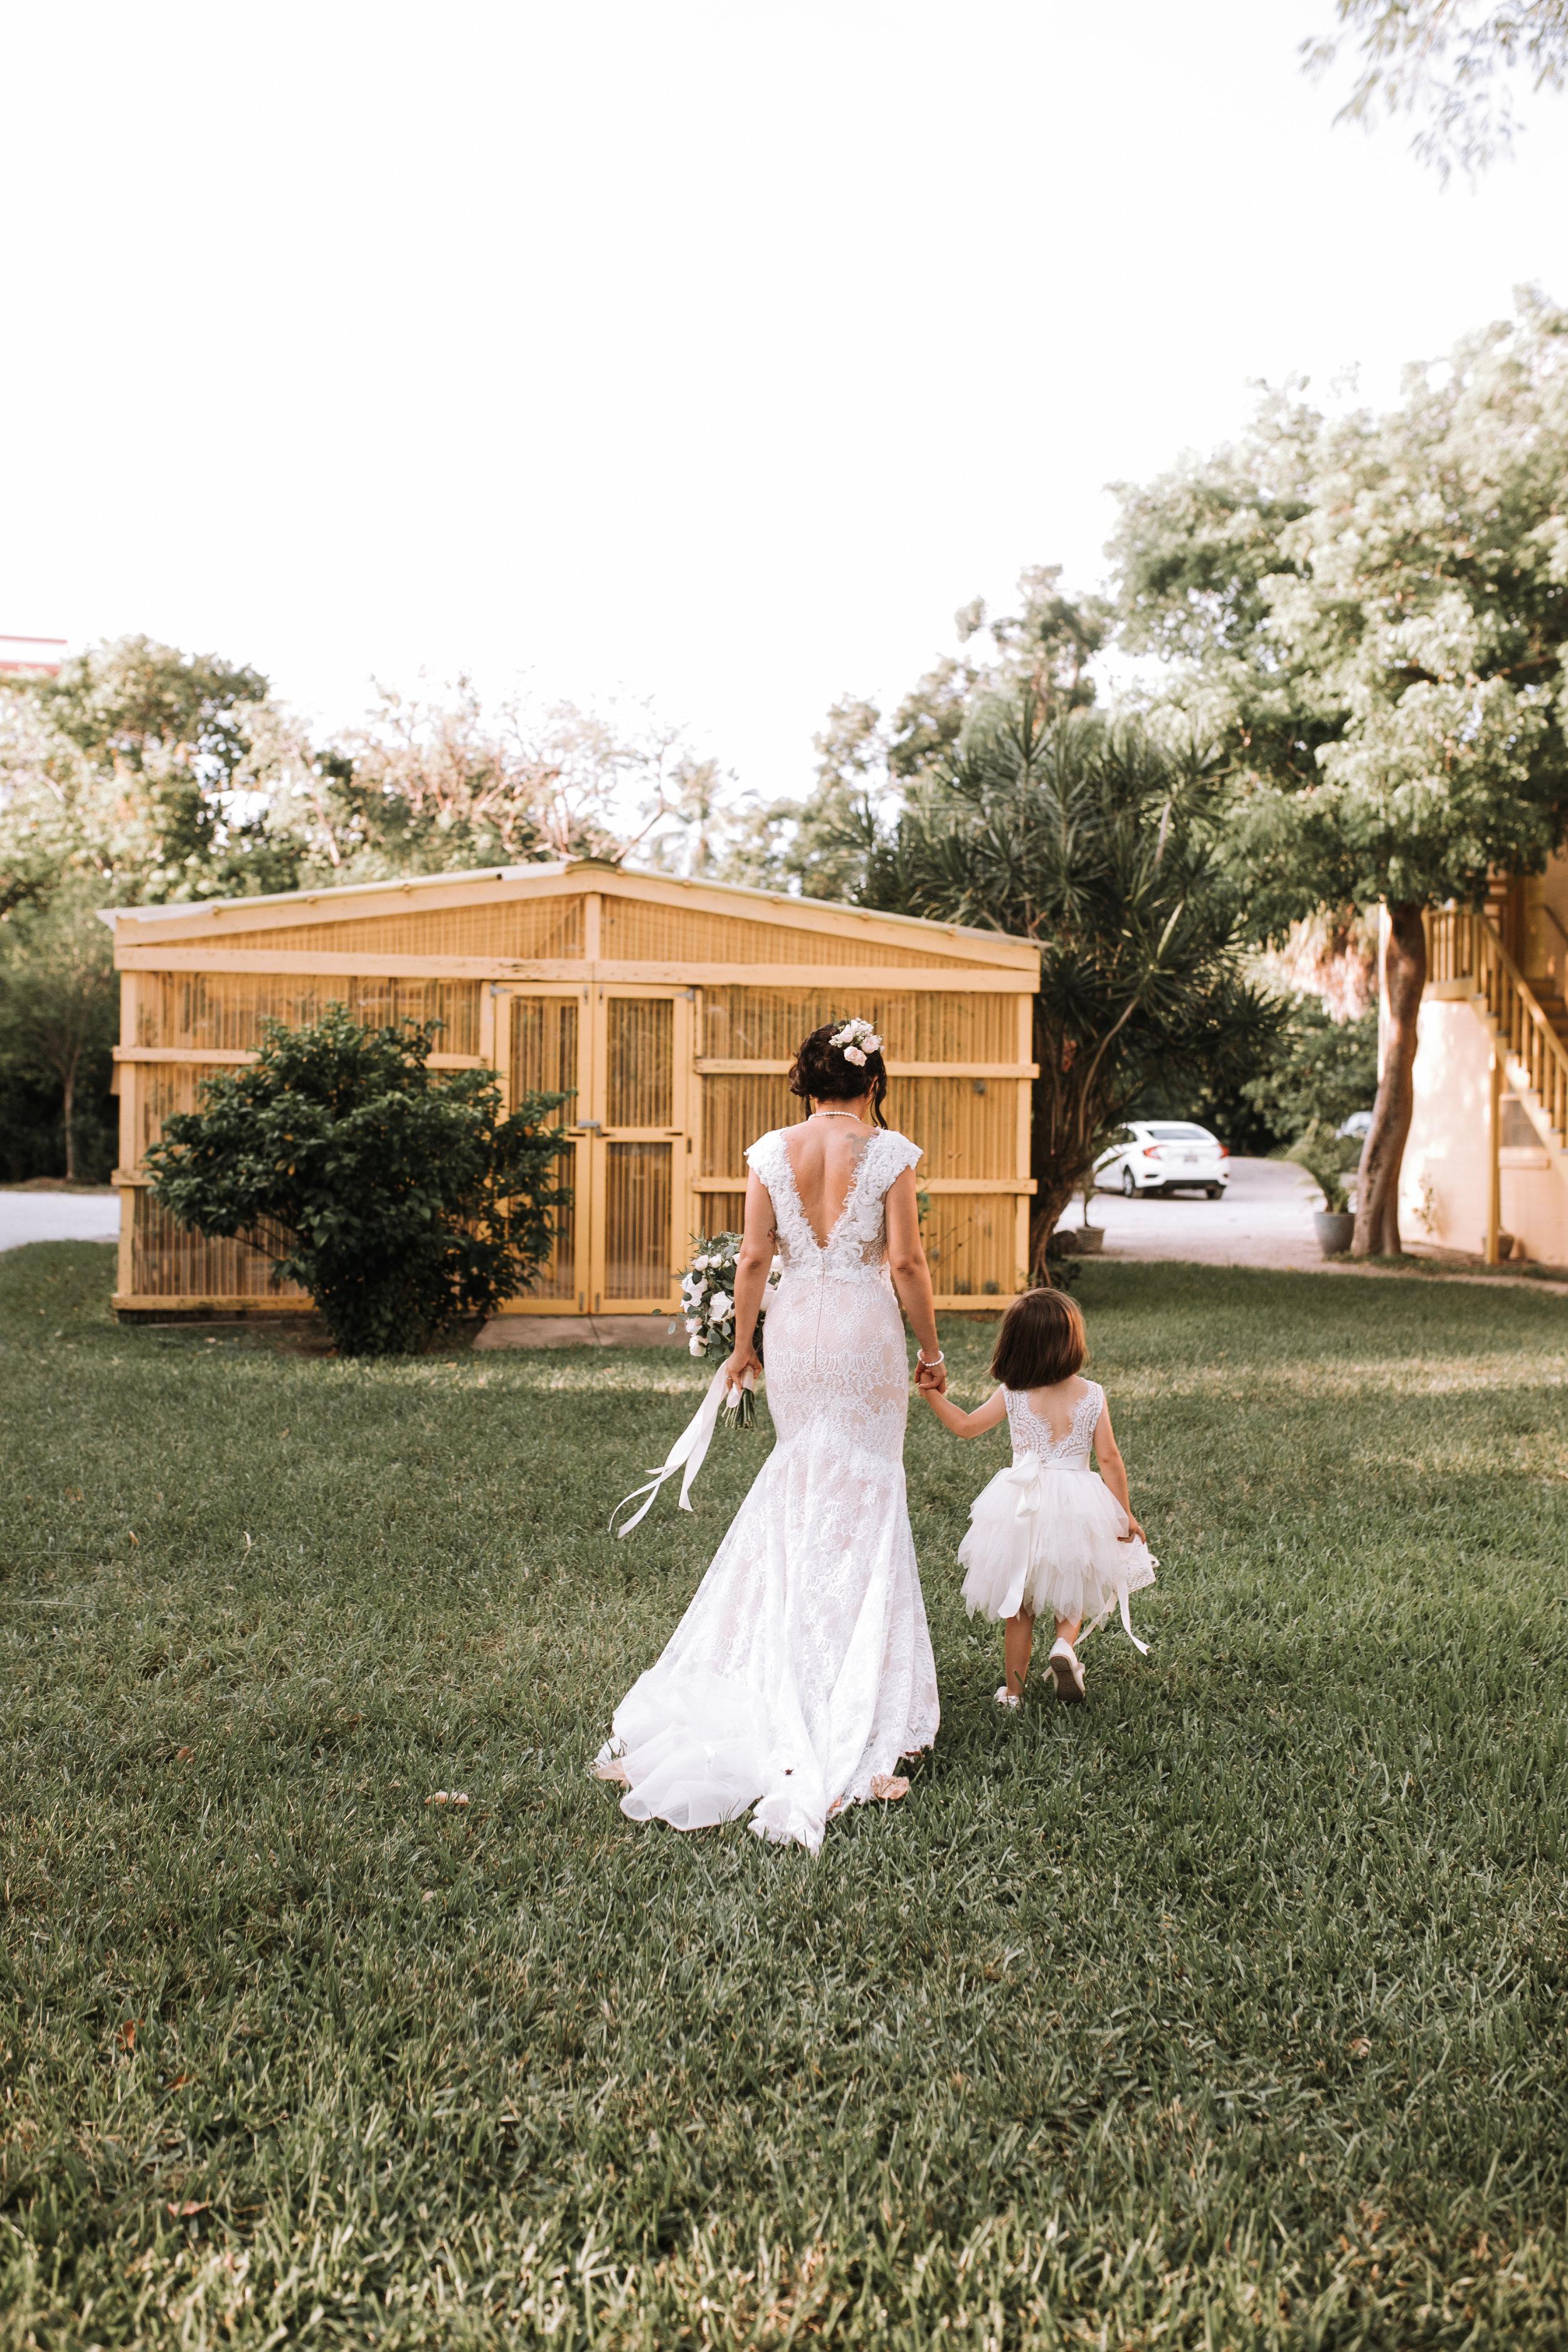 Bonett-House-wedding-fort-lauderdale-florida-Rkm-Photography-260.jpg